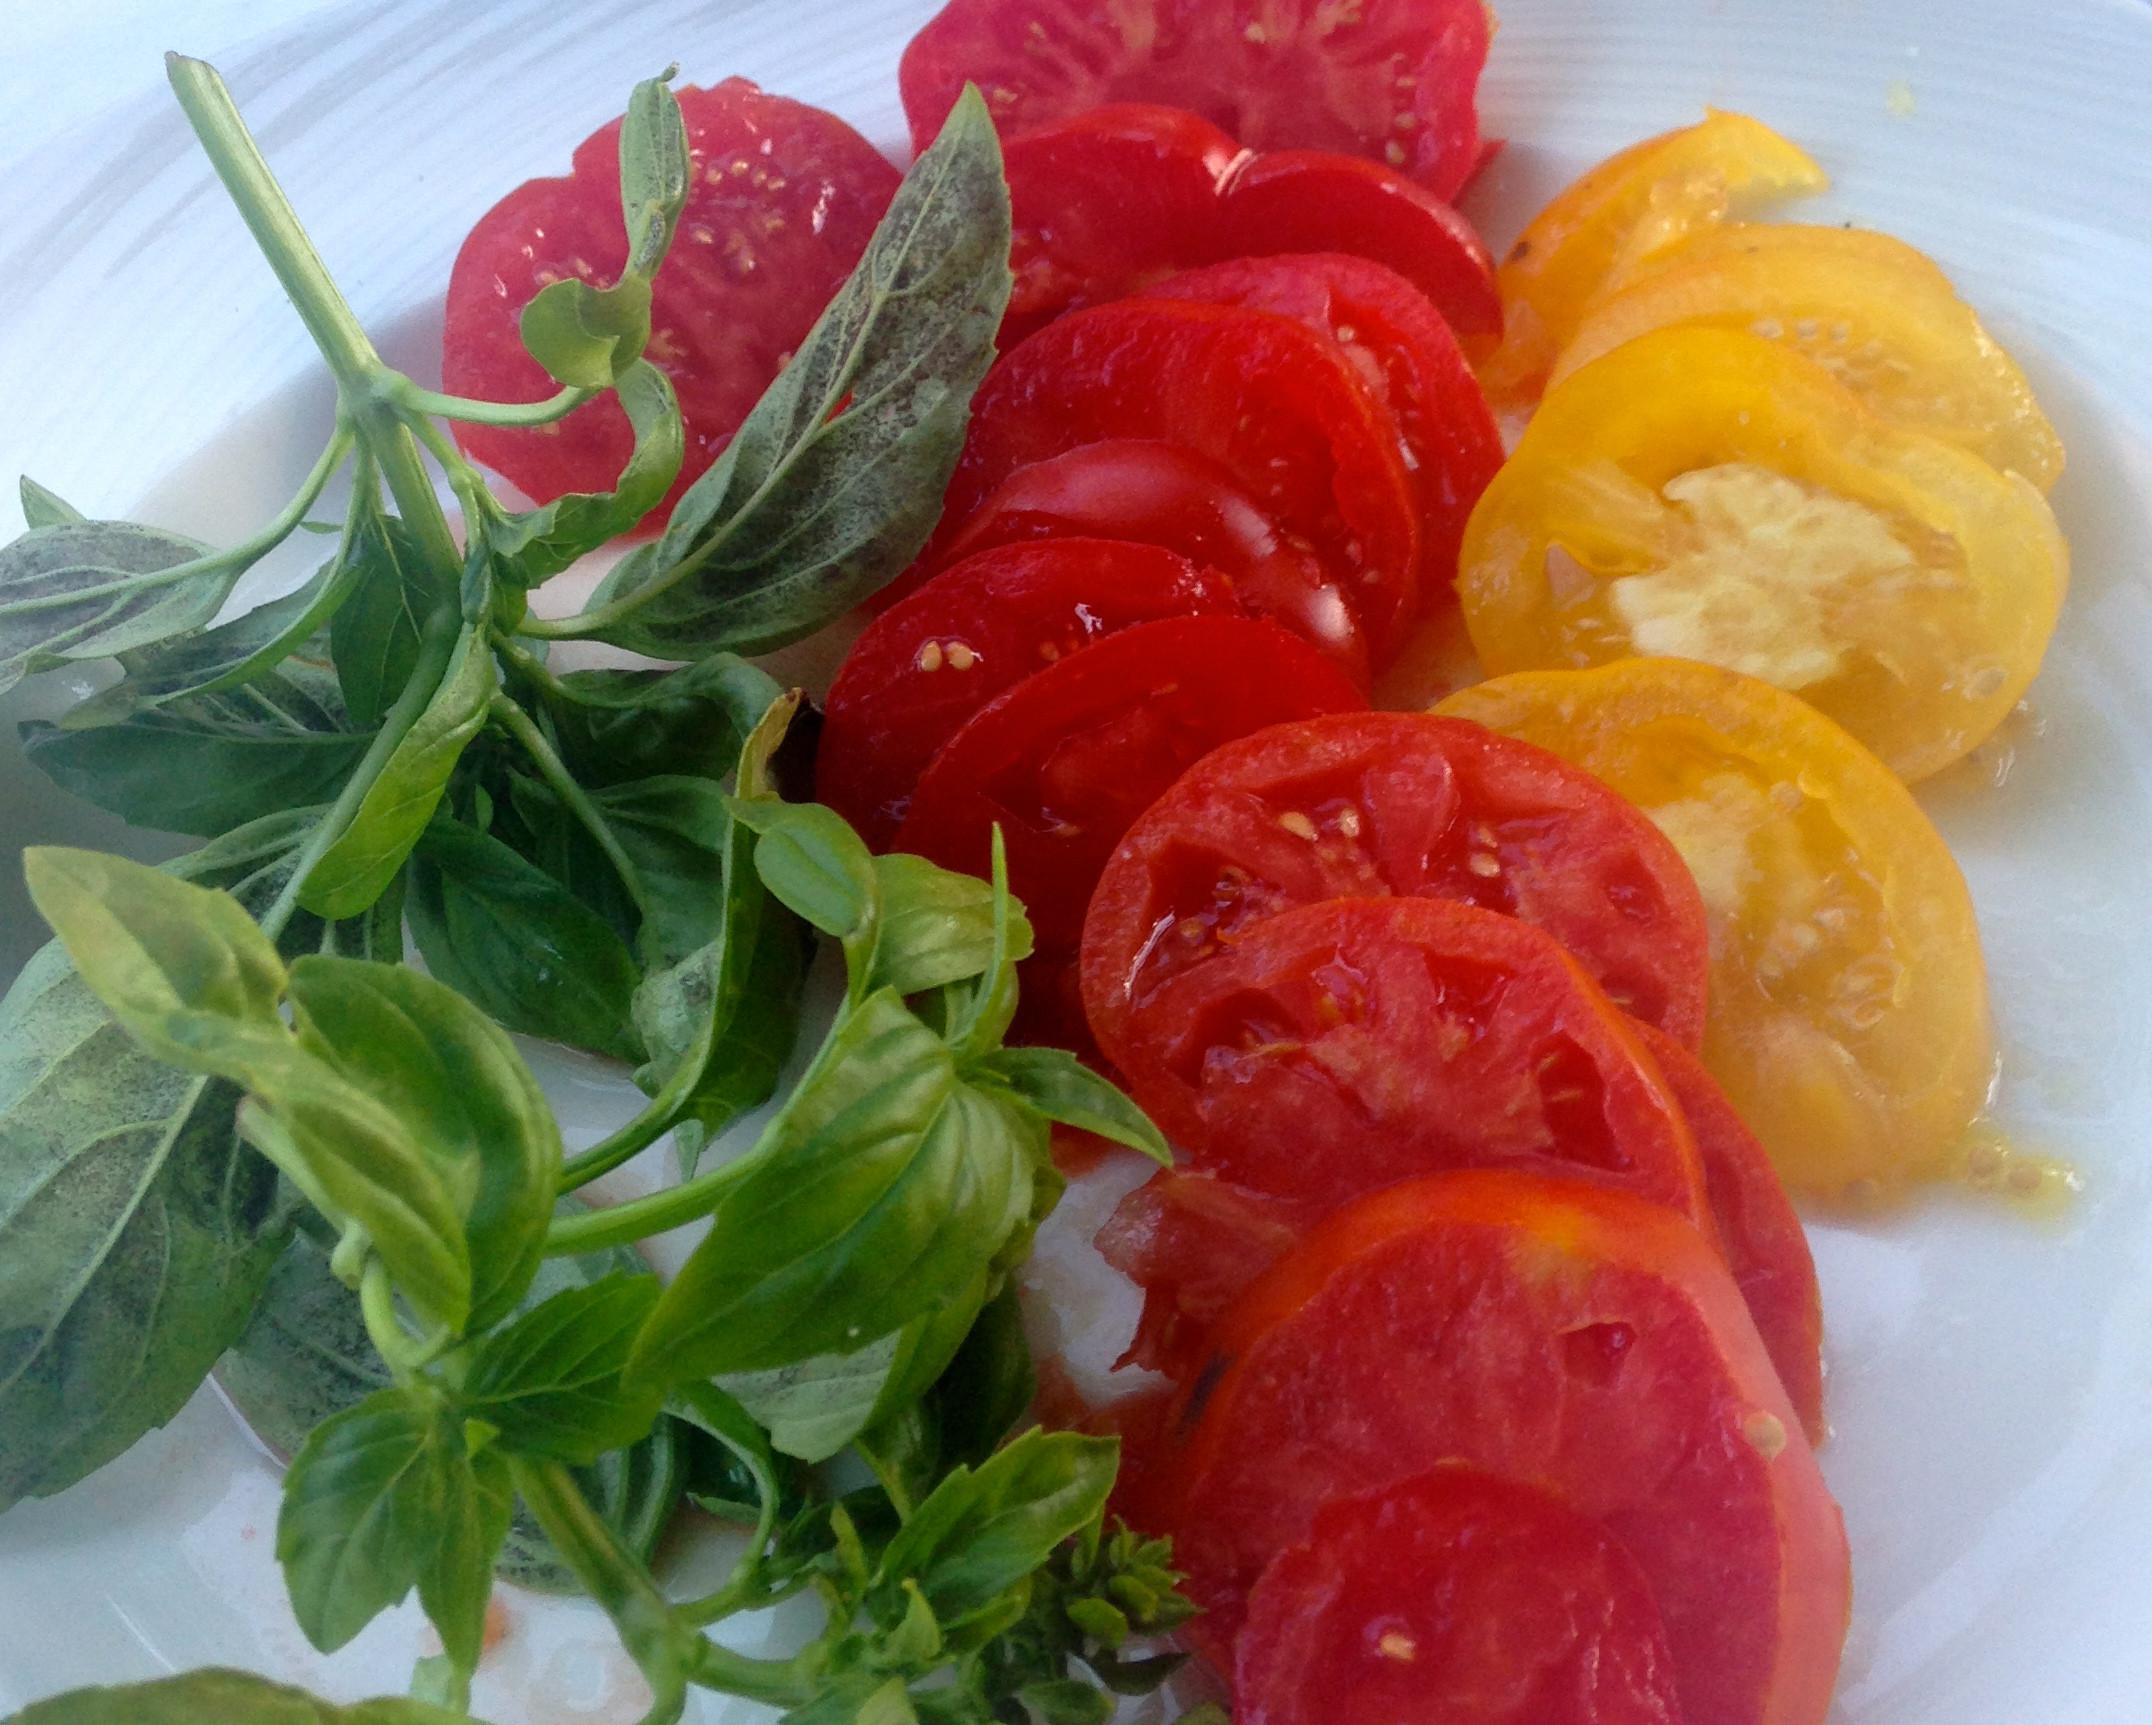 Healthy Tasty Snacks  Ten Healthy & Tasty Snacks – Katie Austin